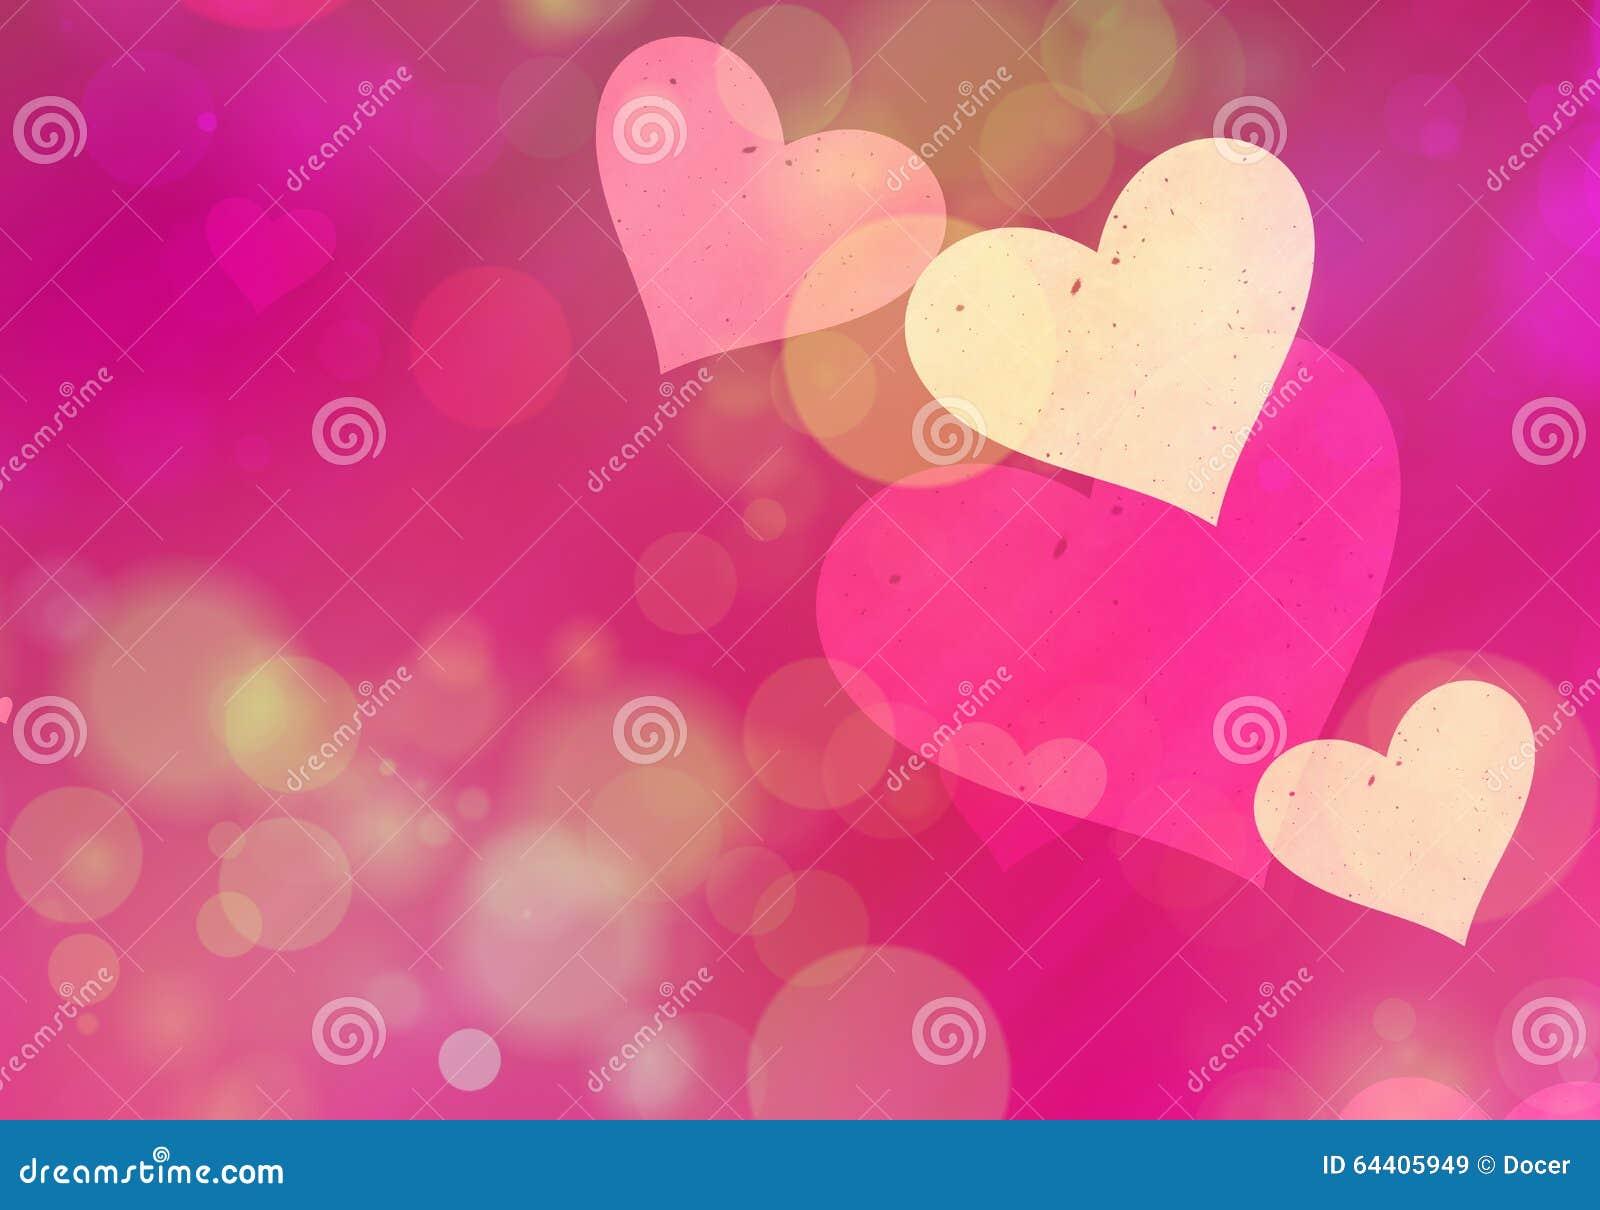 Multicolored hearts bokeh background of a love symbol stock multicolored hearts bokeh background of a love symbol biocorpaavc